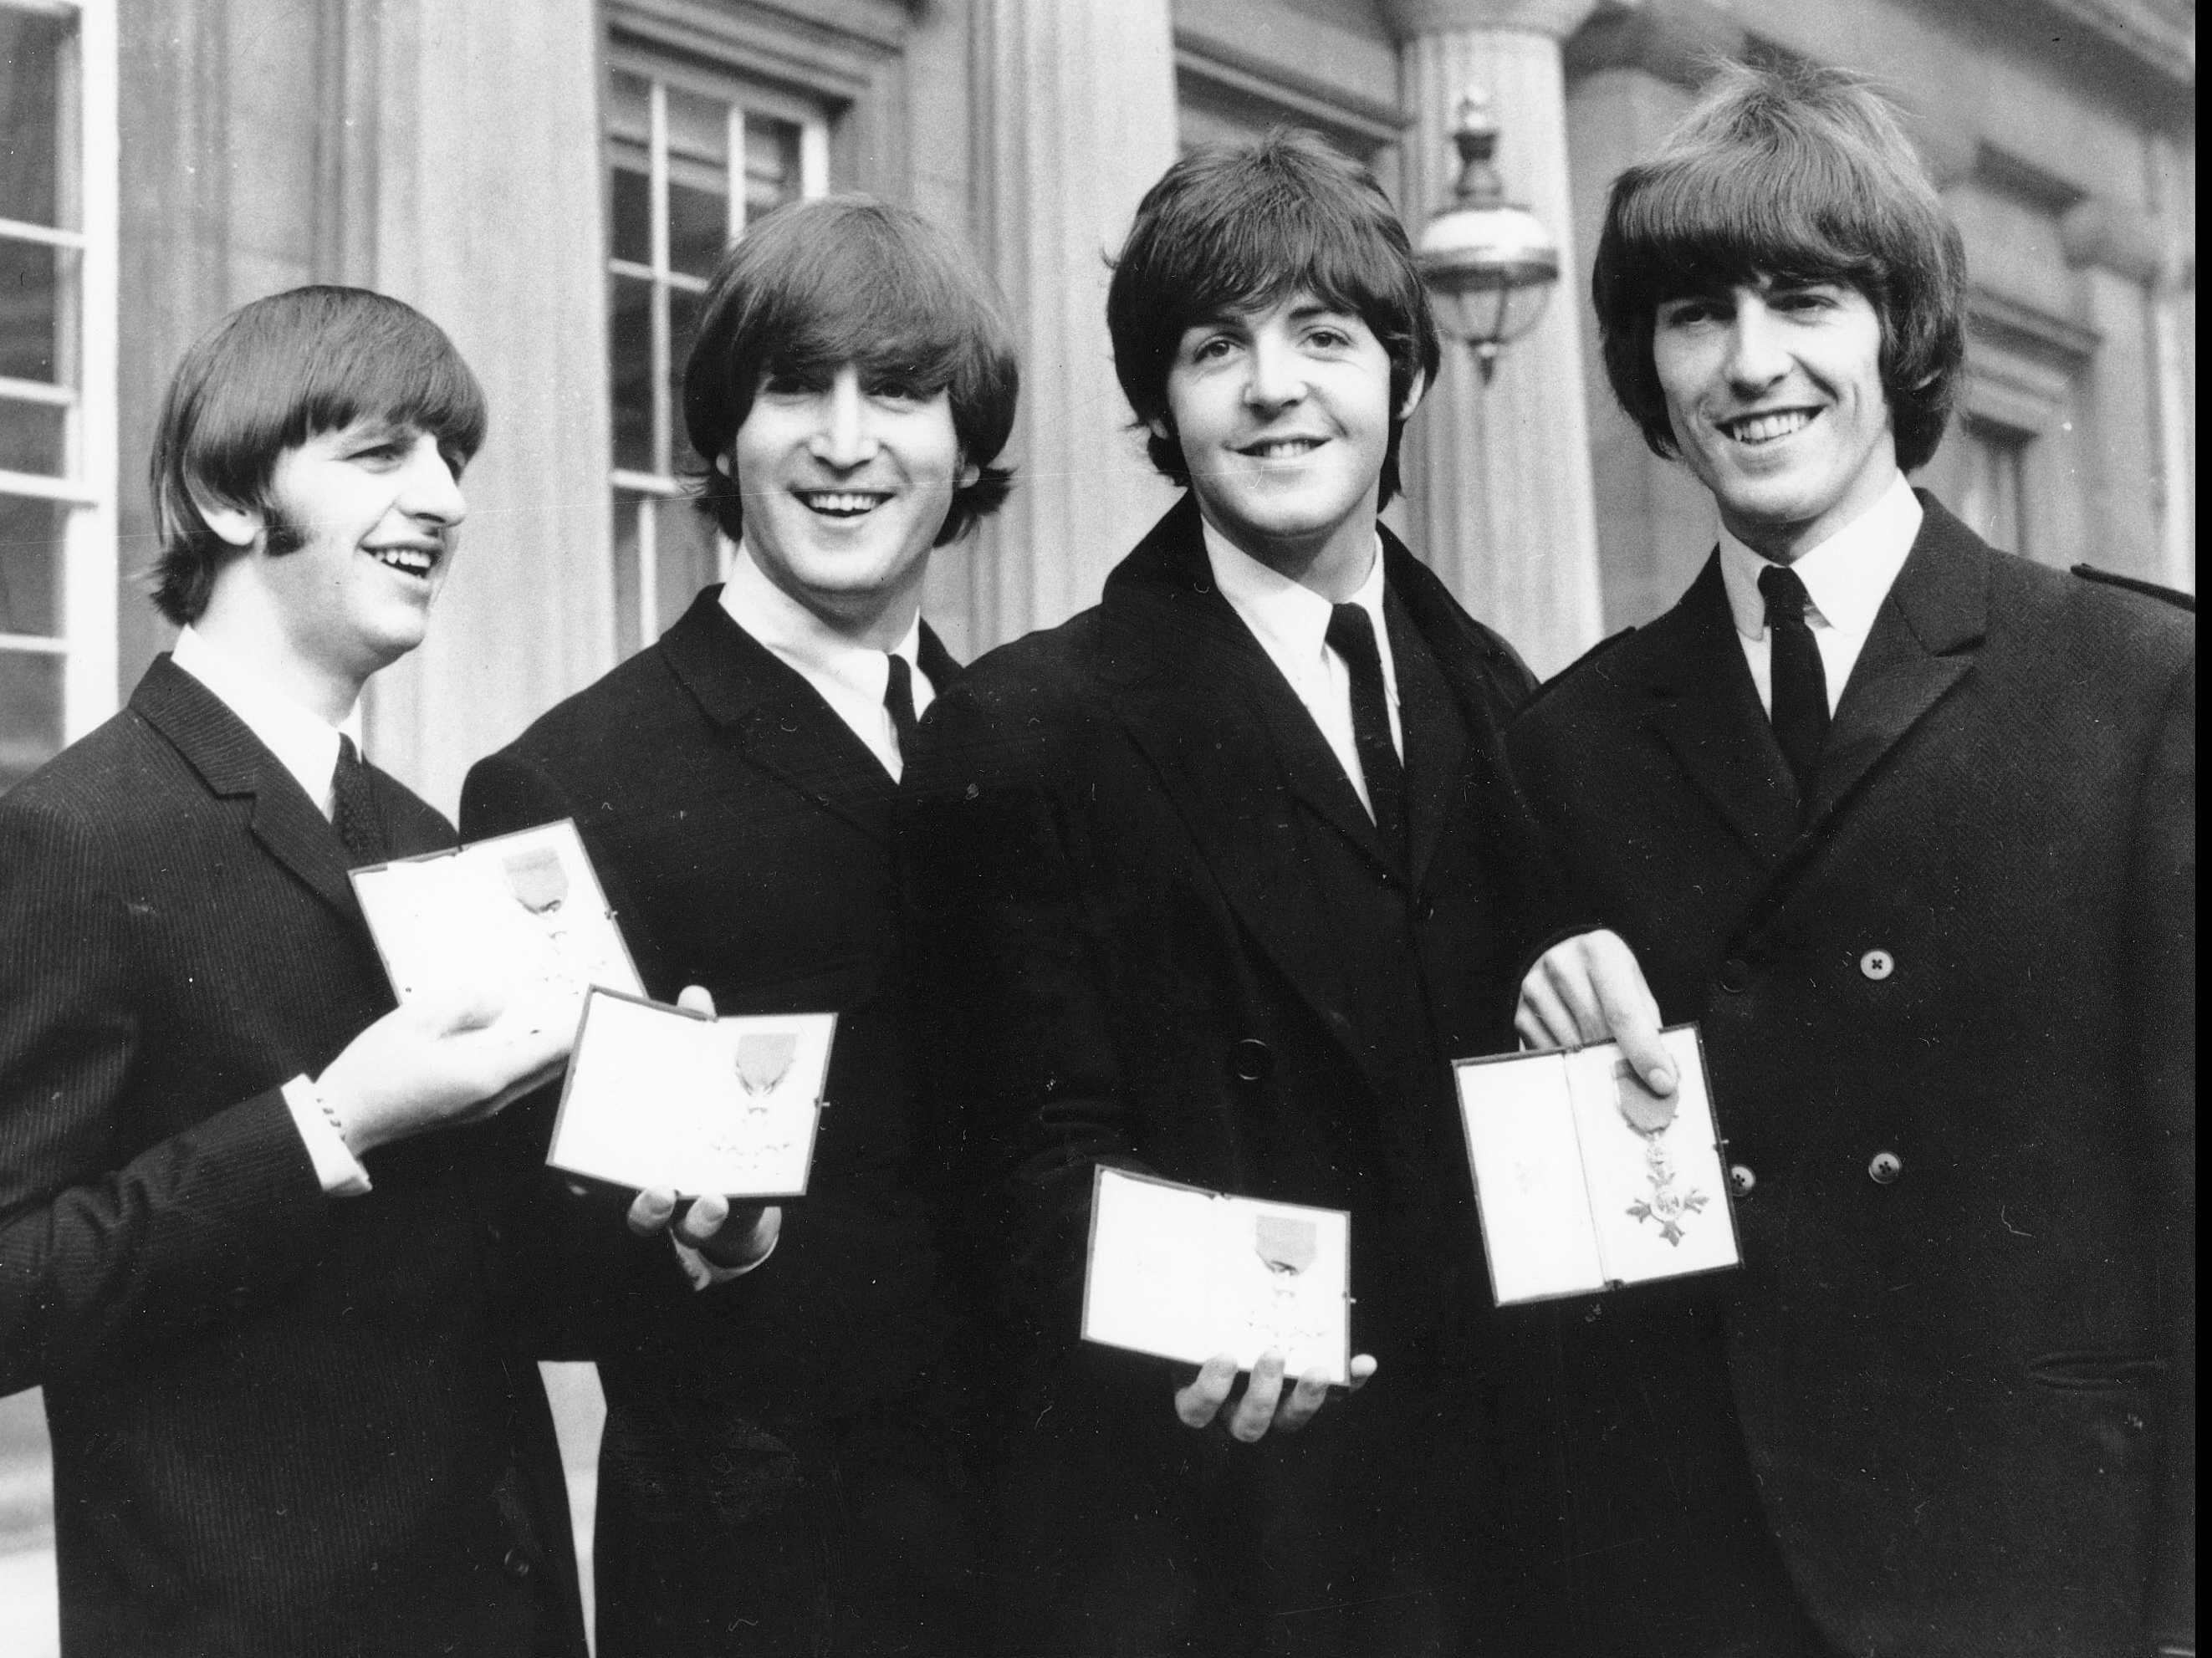 Getting Better: Beatles' 'Sgt. Pepper' Named Top Album in UK